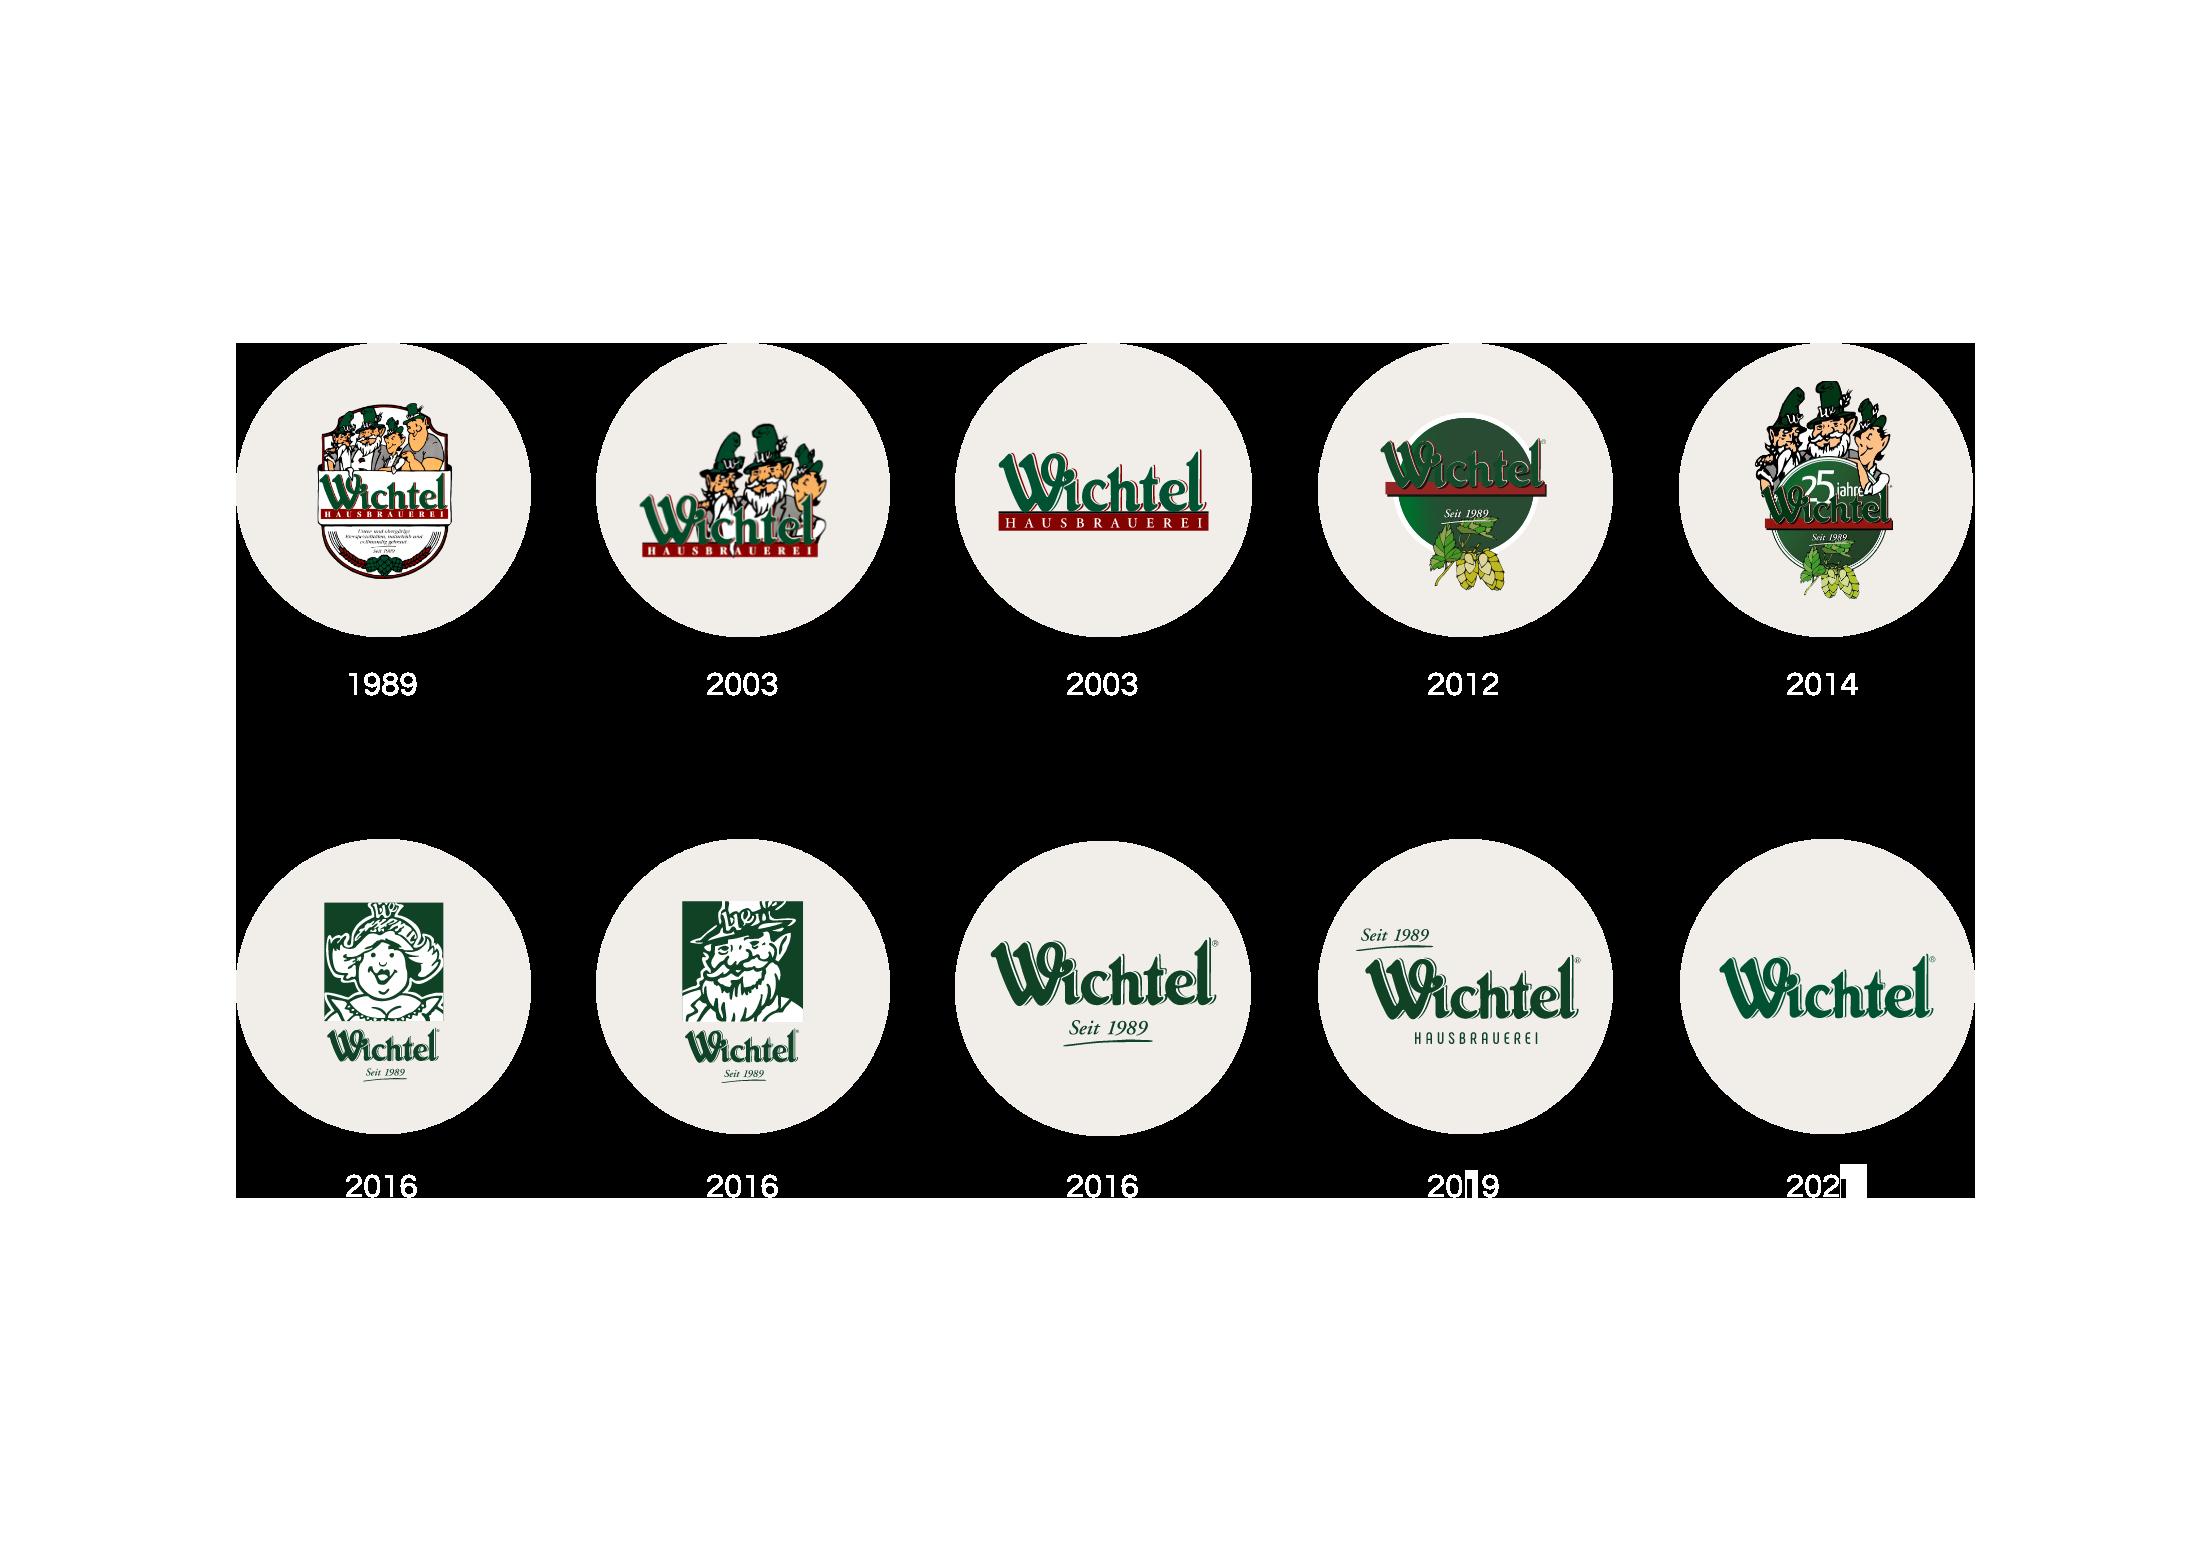 https://wichtel.de/wp-content/uploads/2021/04/Logos.png